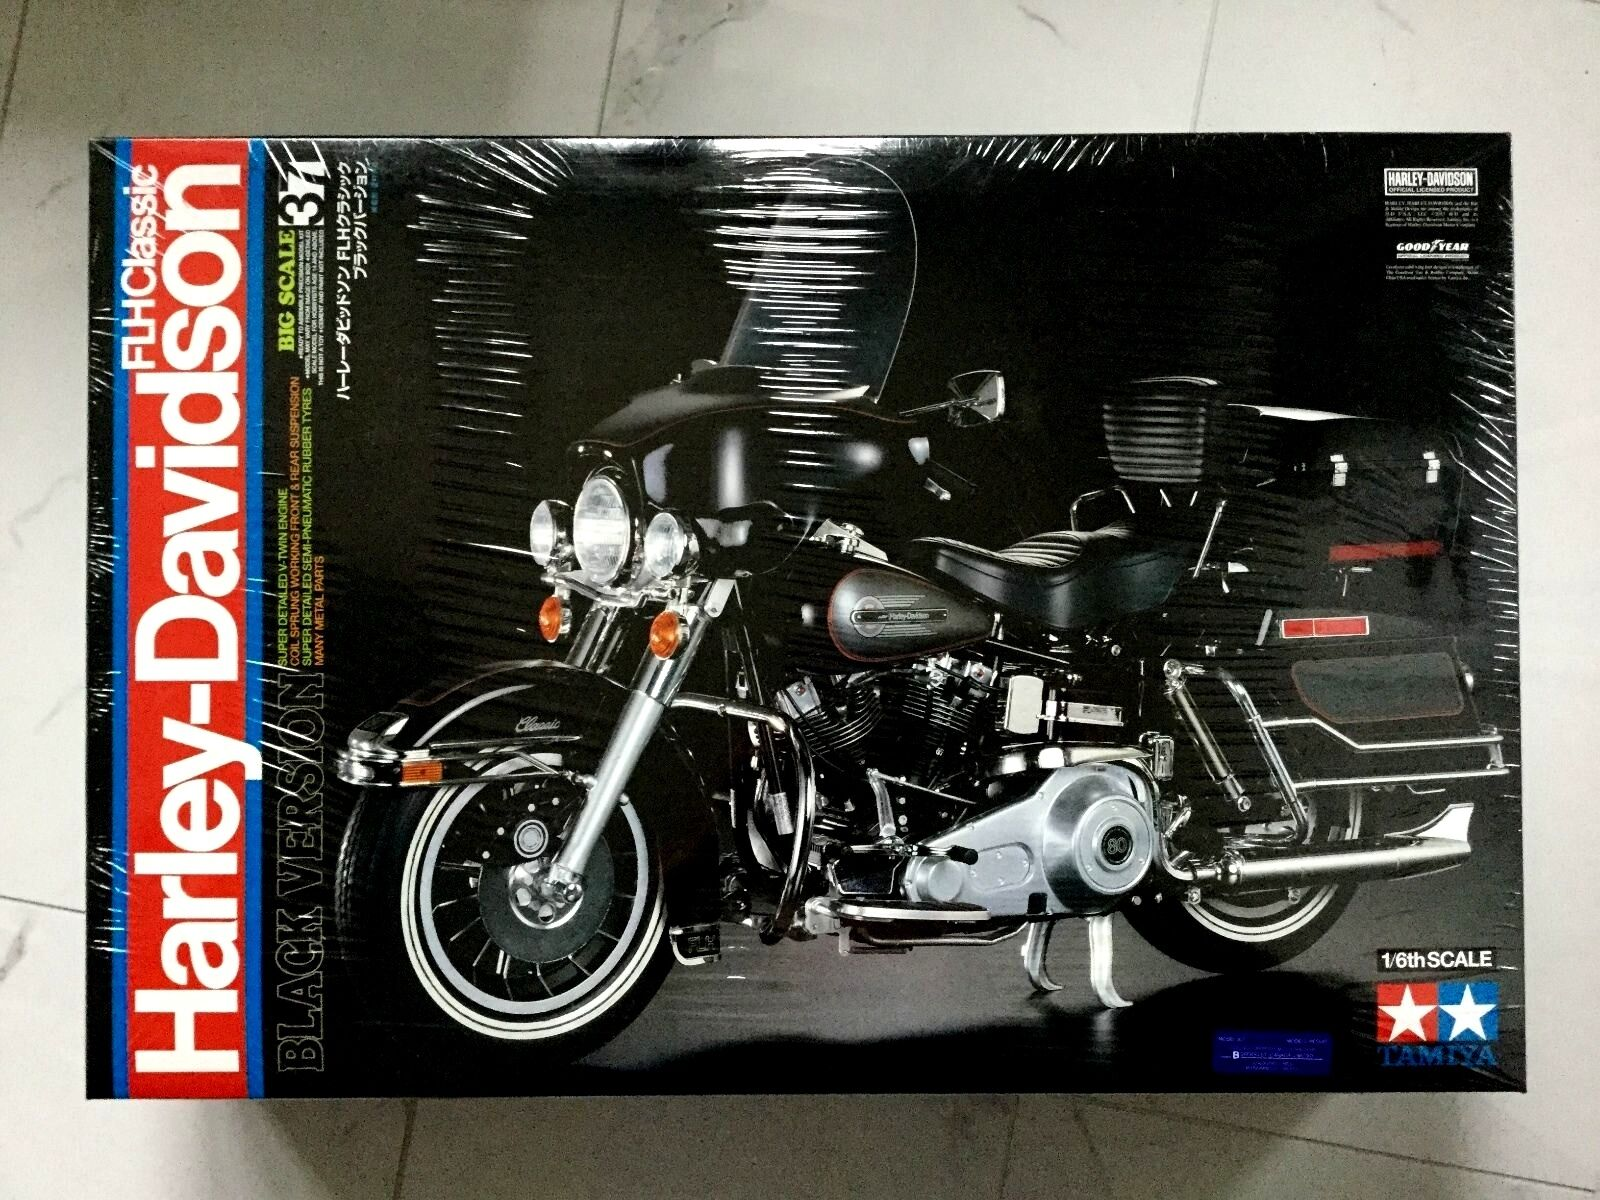 TAMIYA 1 6 HARLEY-DAVIDSON FLH CLASSIC MOTORCYCLE PLASTIC MODEL KIT F S